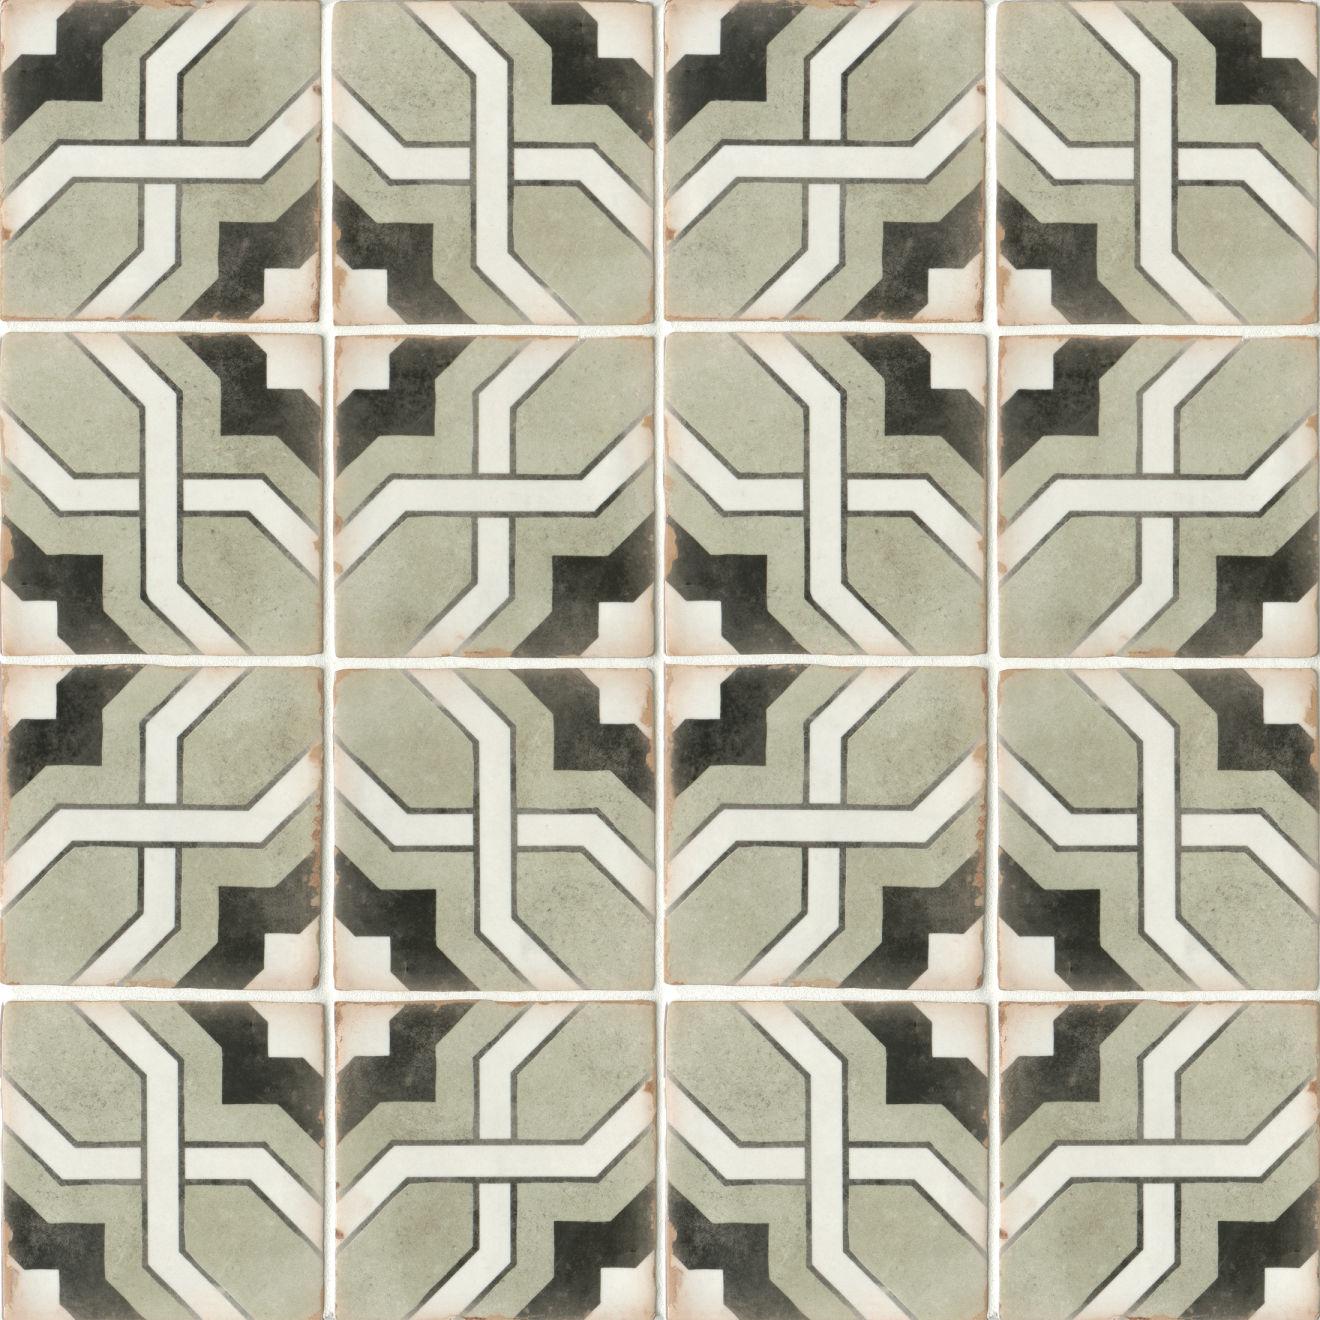 "Casablanca 5"" x 5"" Matte Ceramic Floor and Wall Tile in Torres"